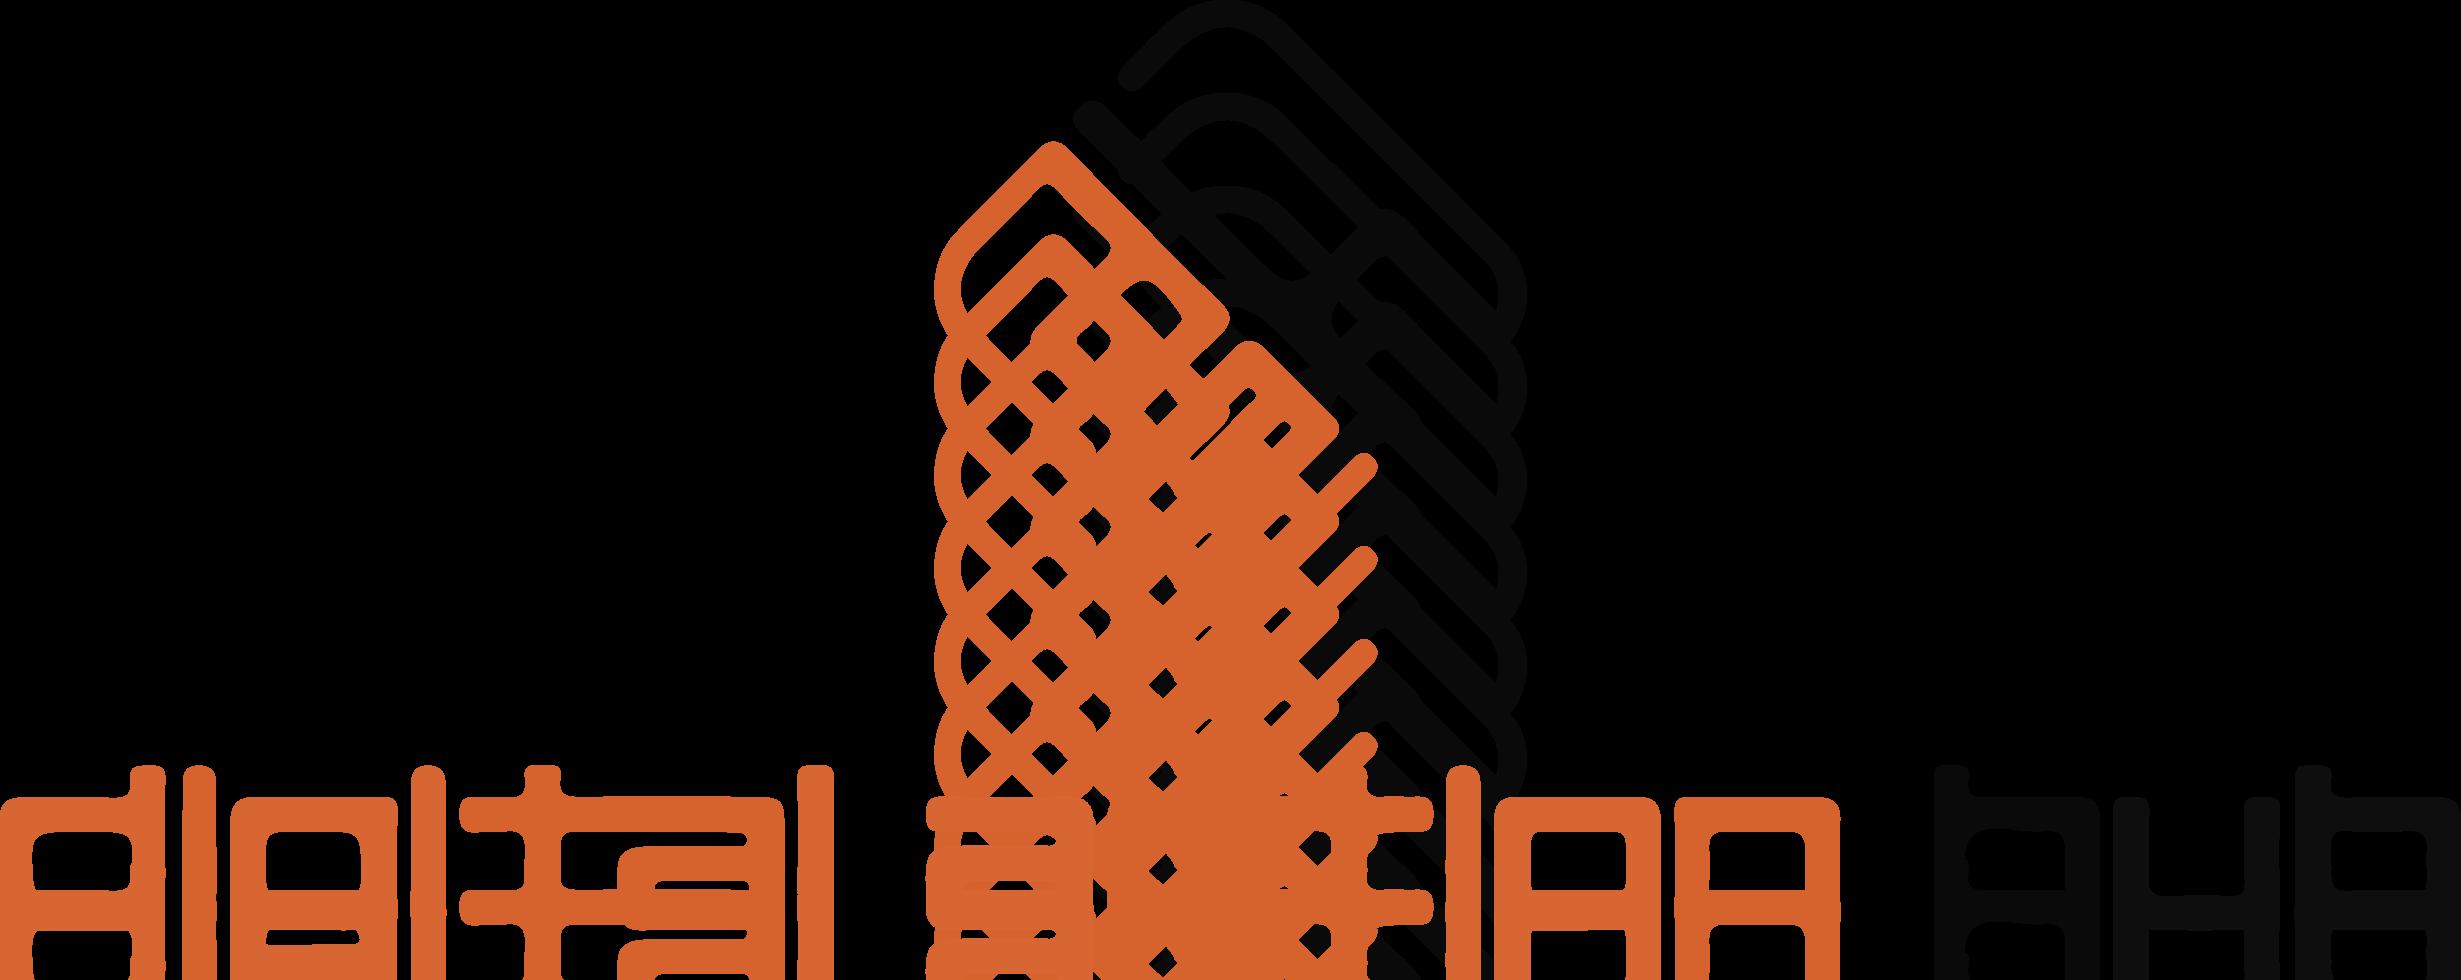 DigitalActionHub-Logo1.png